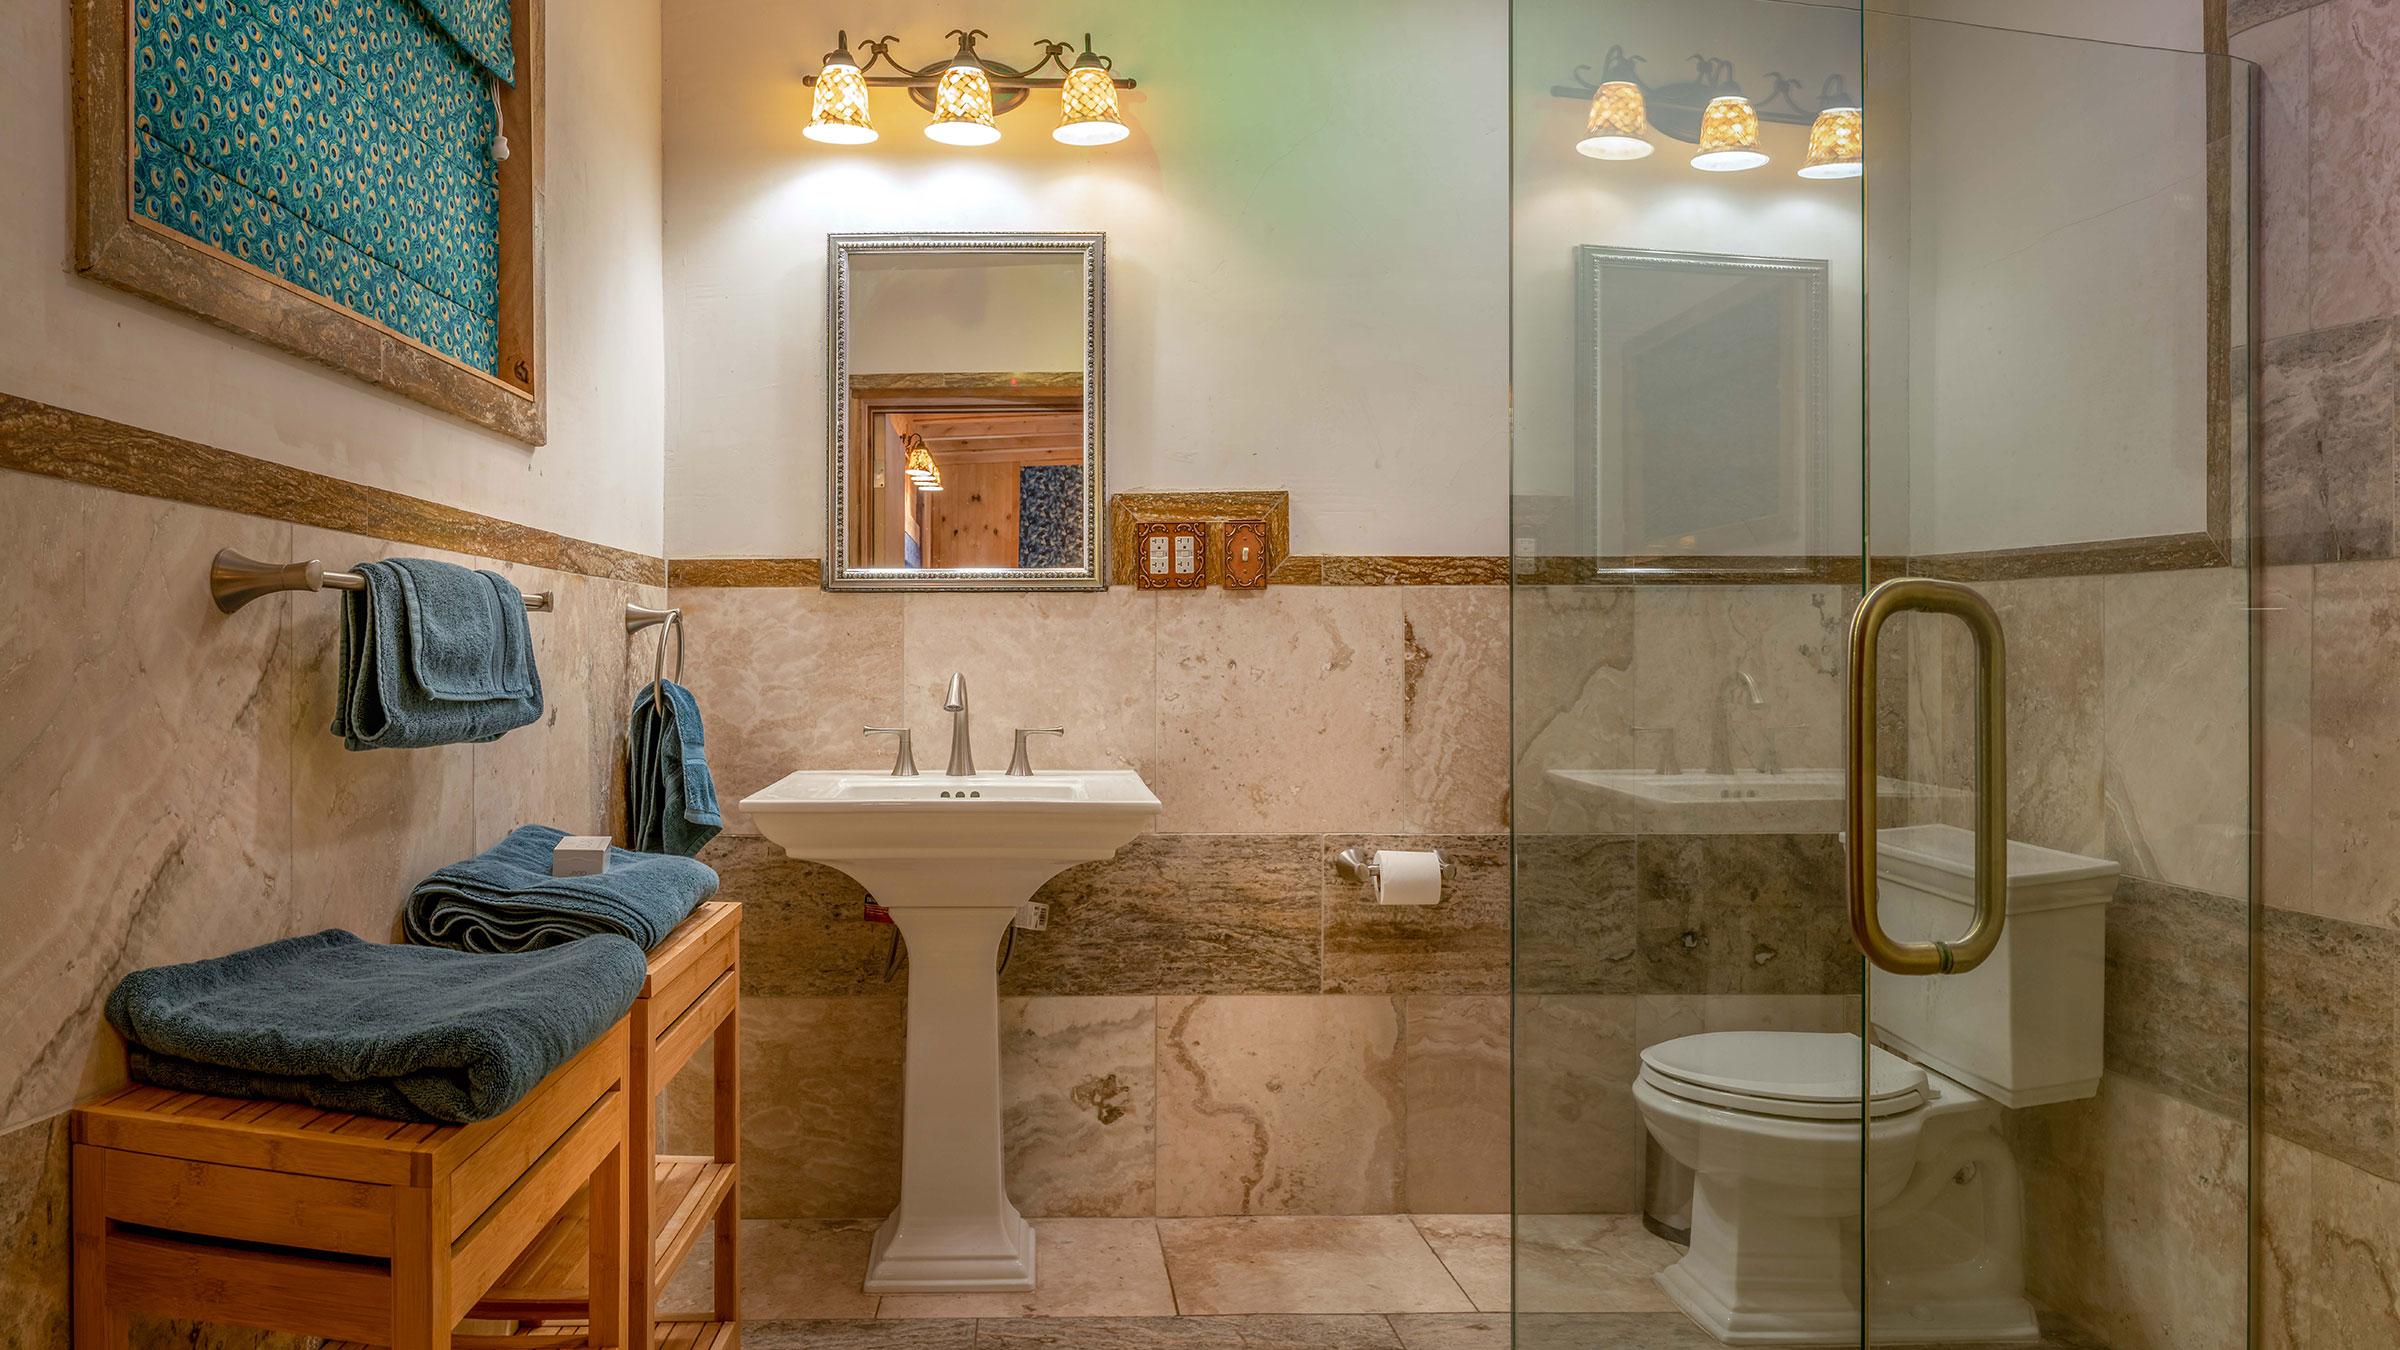 Neve Bungalow room No.2 bathroom